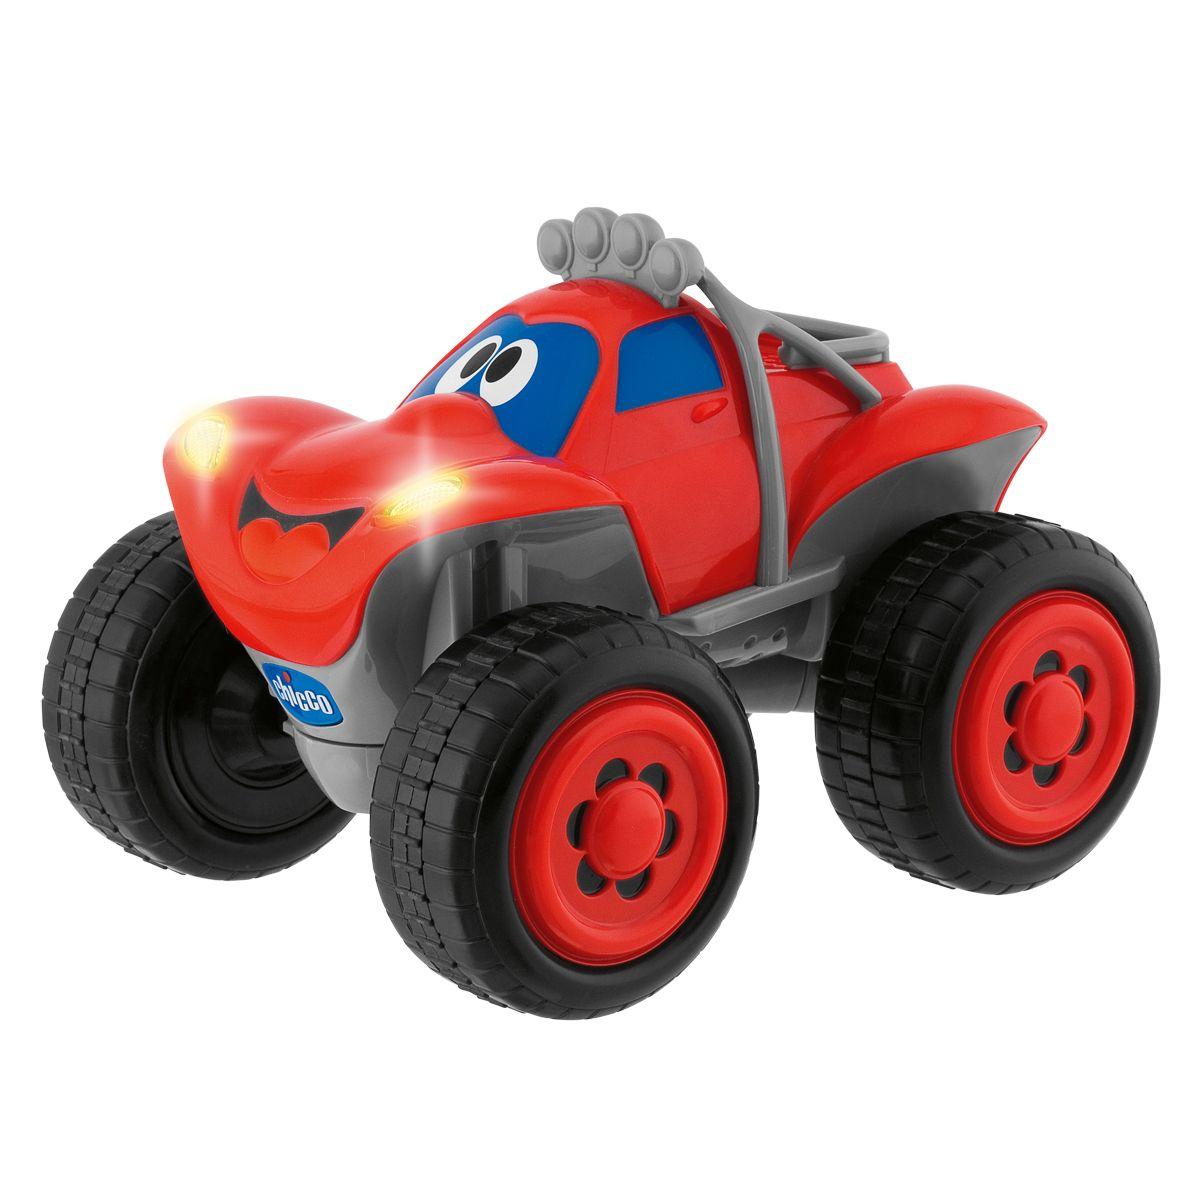 "Машинка Chicco ""Билли-большие колеса"", красная, 2г+ от интернет магазина iqbaby.ru"